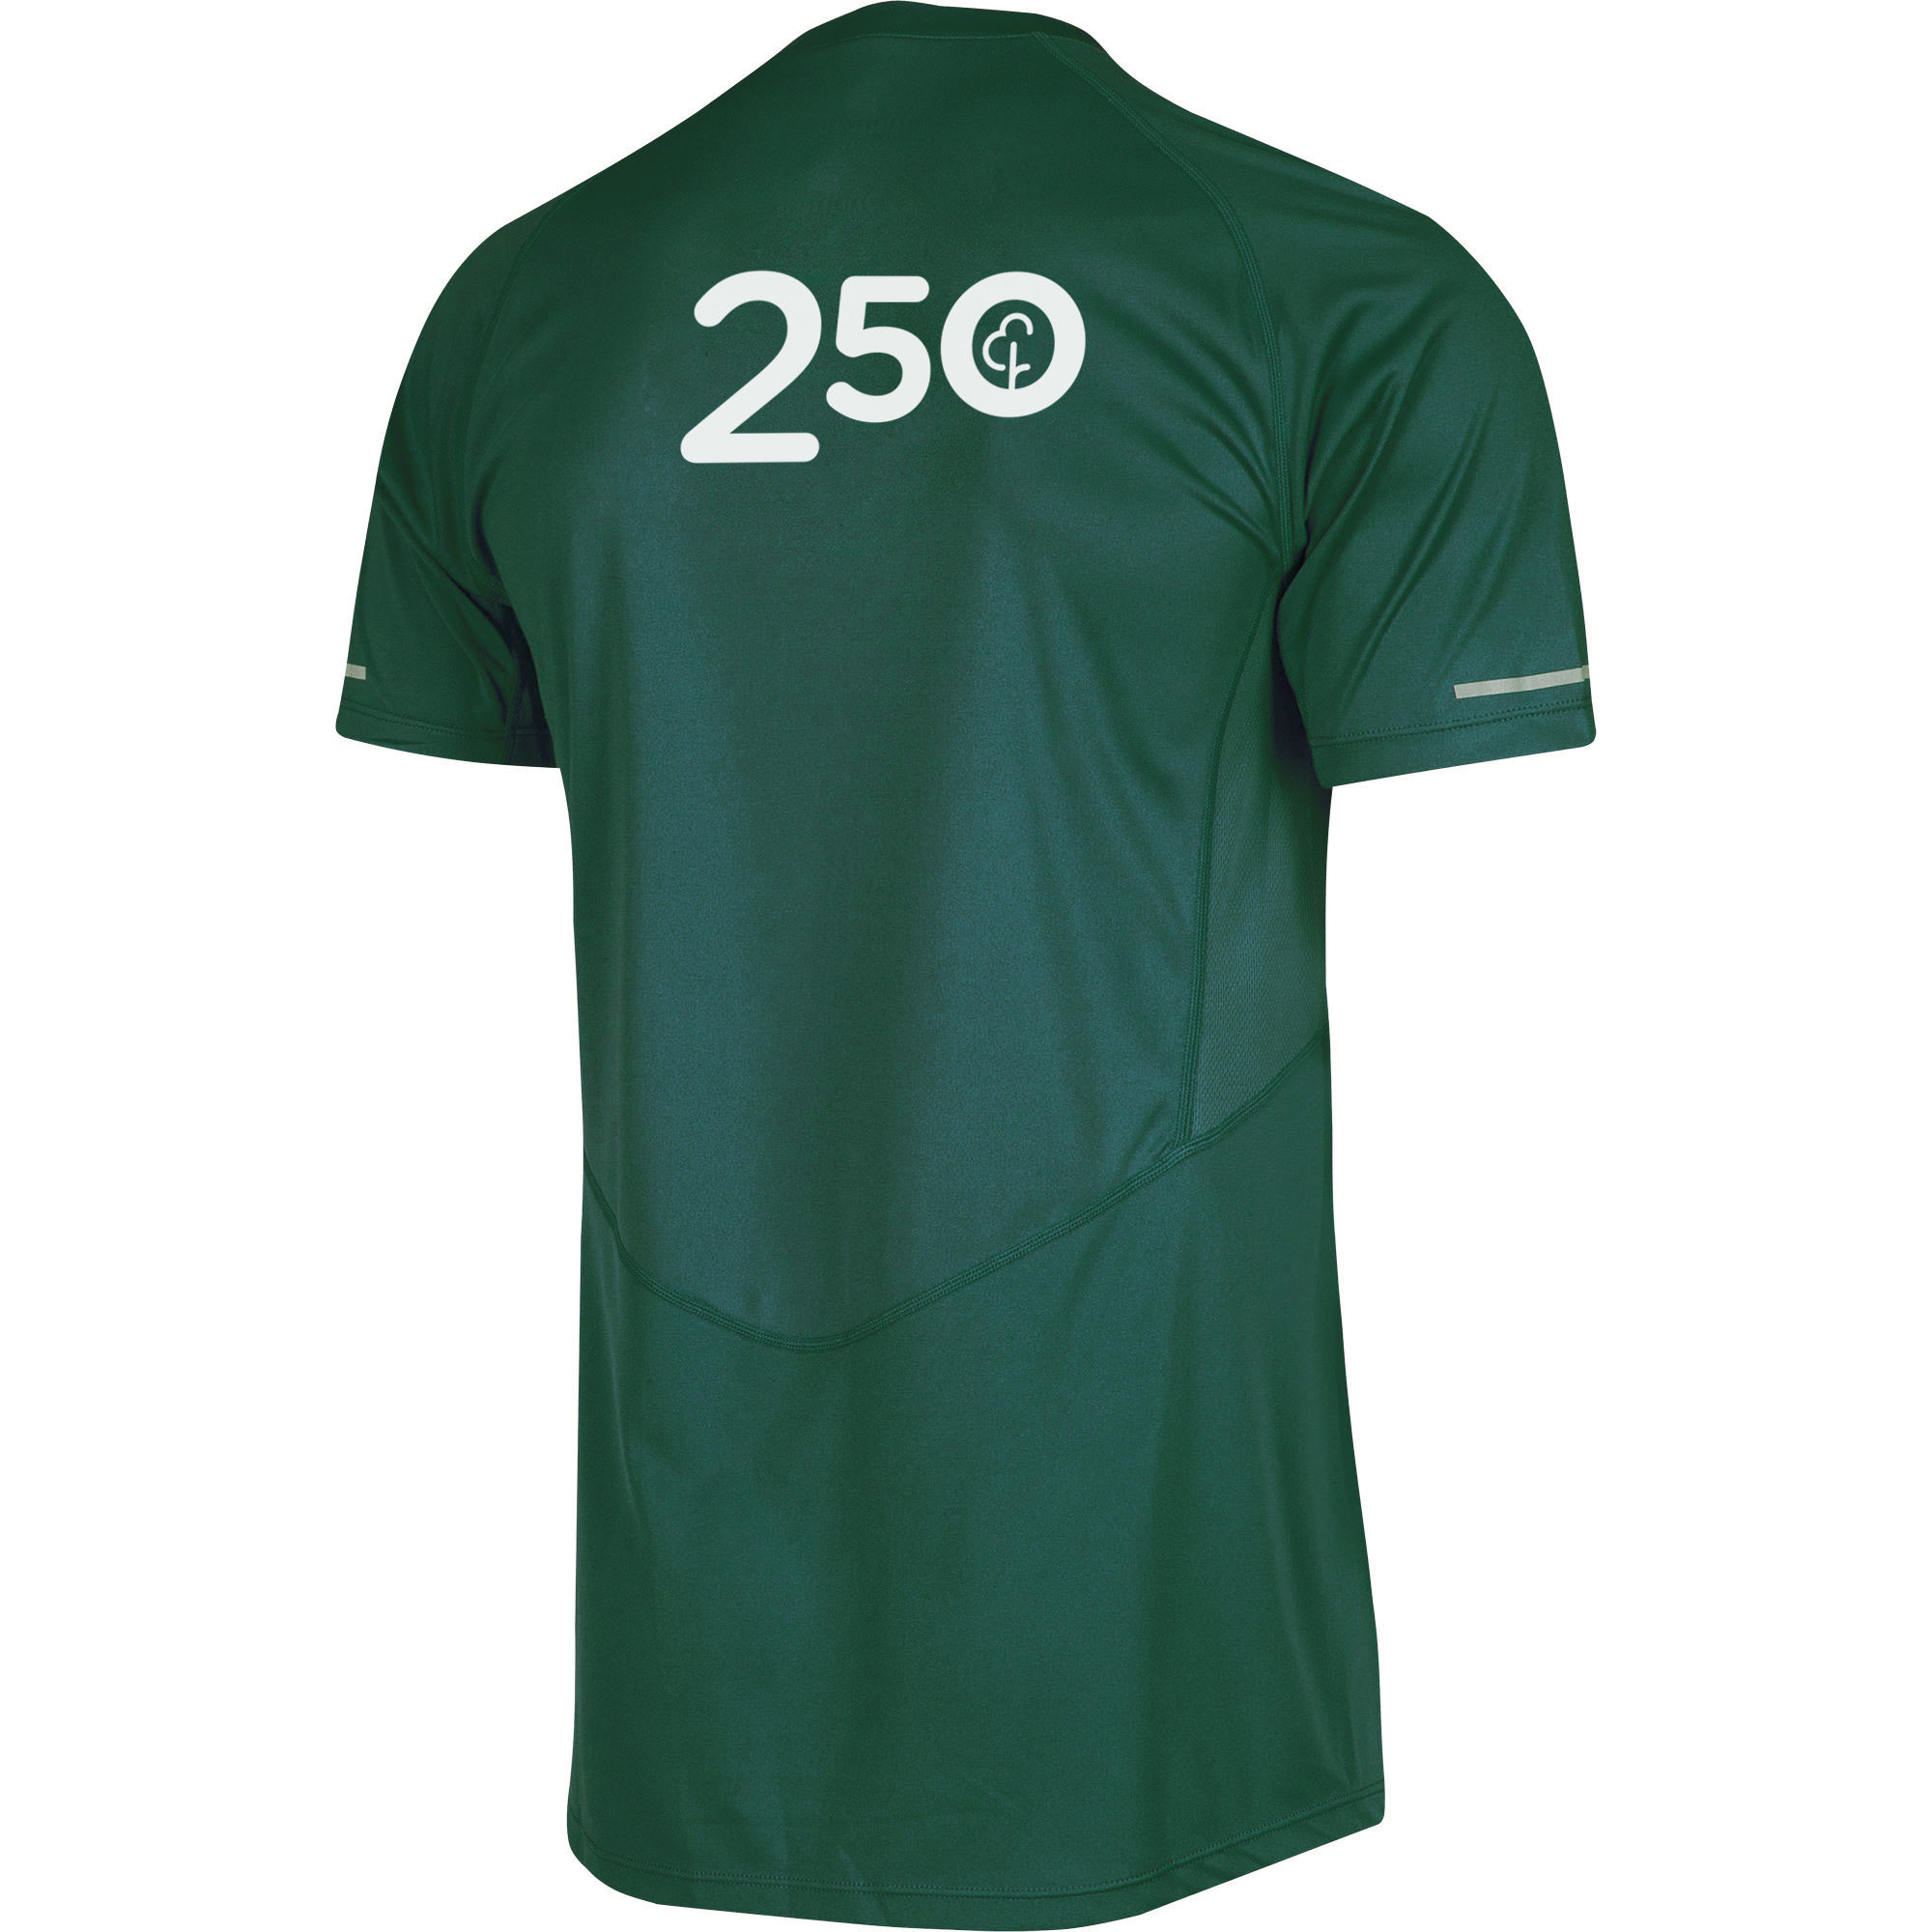 250 t-shirt back